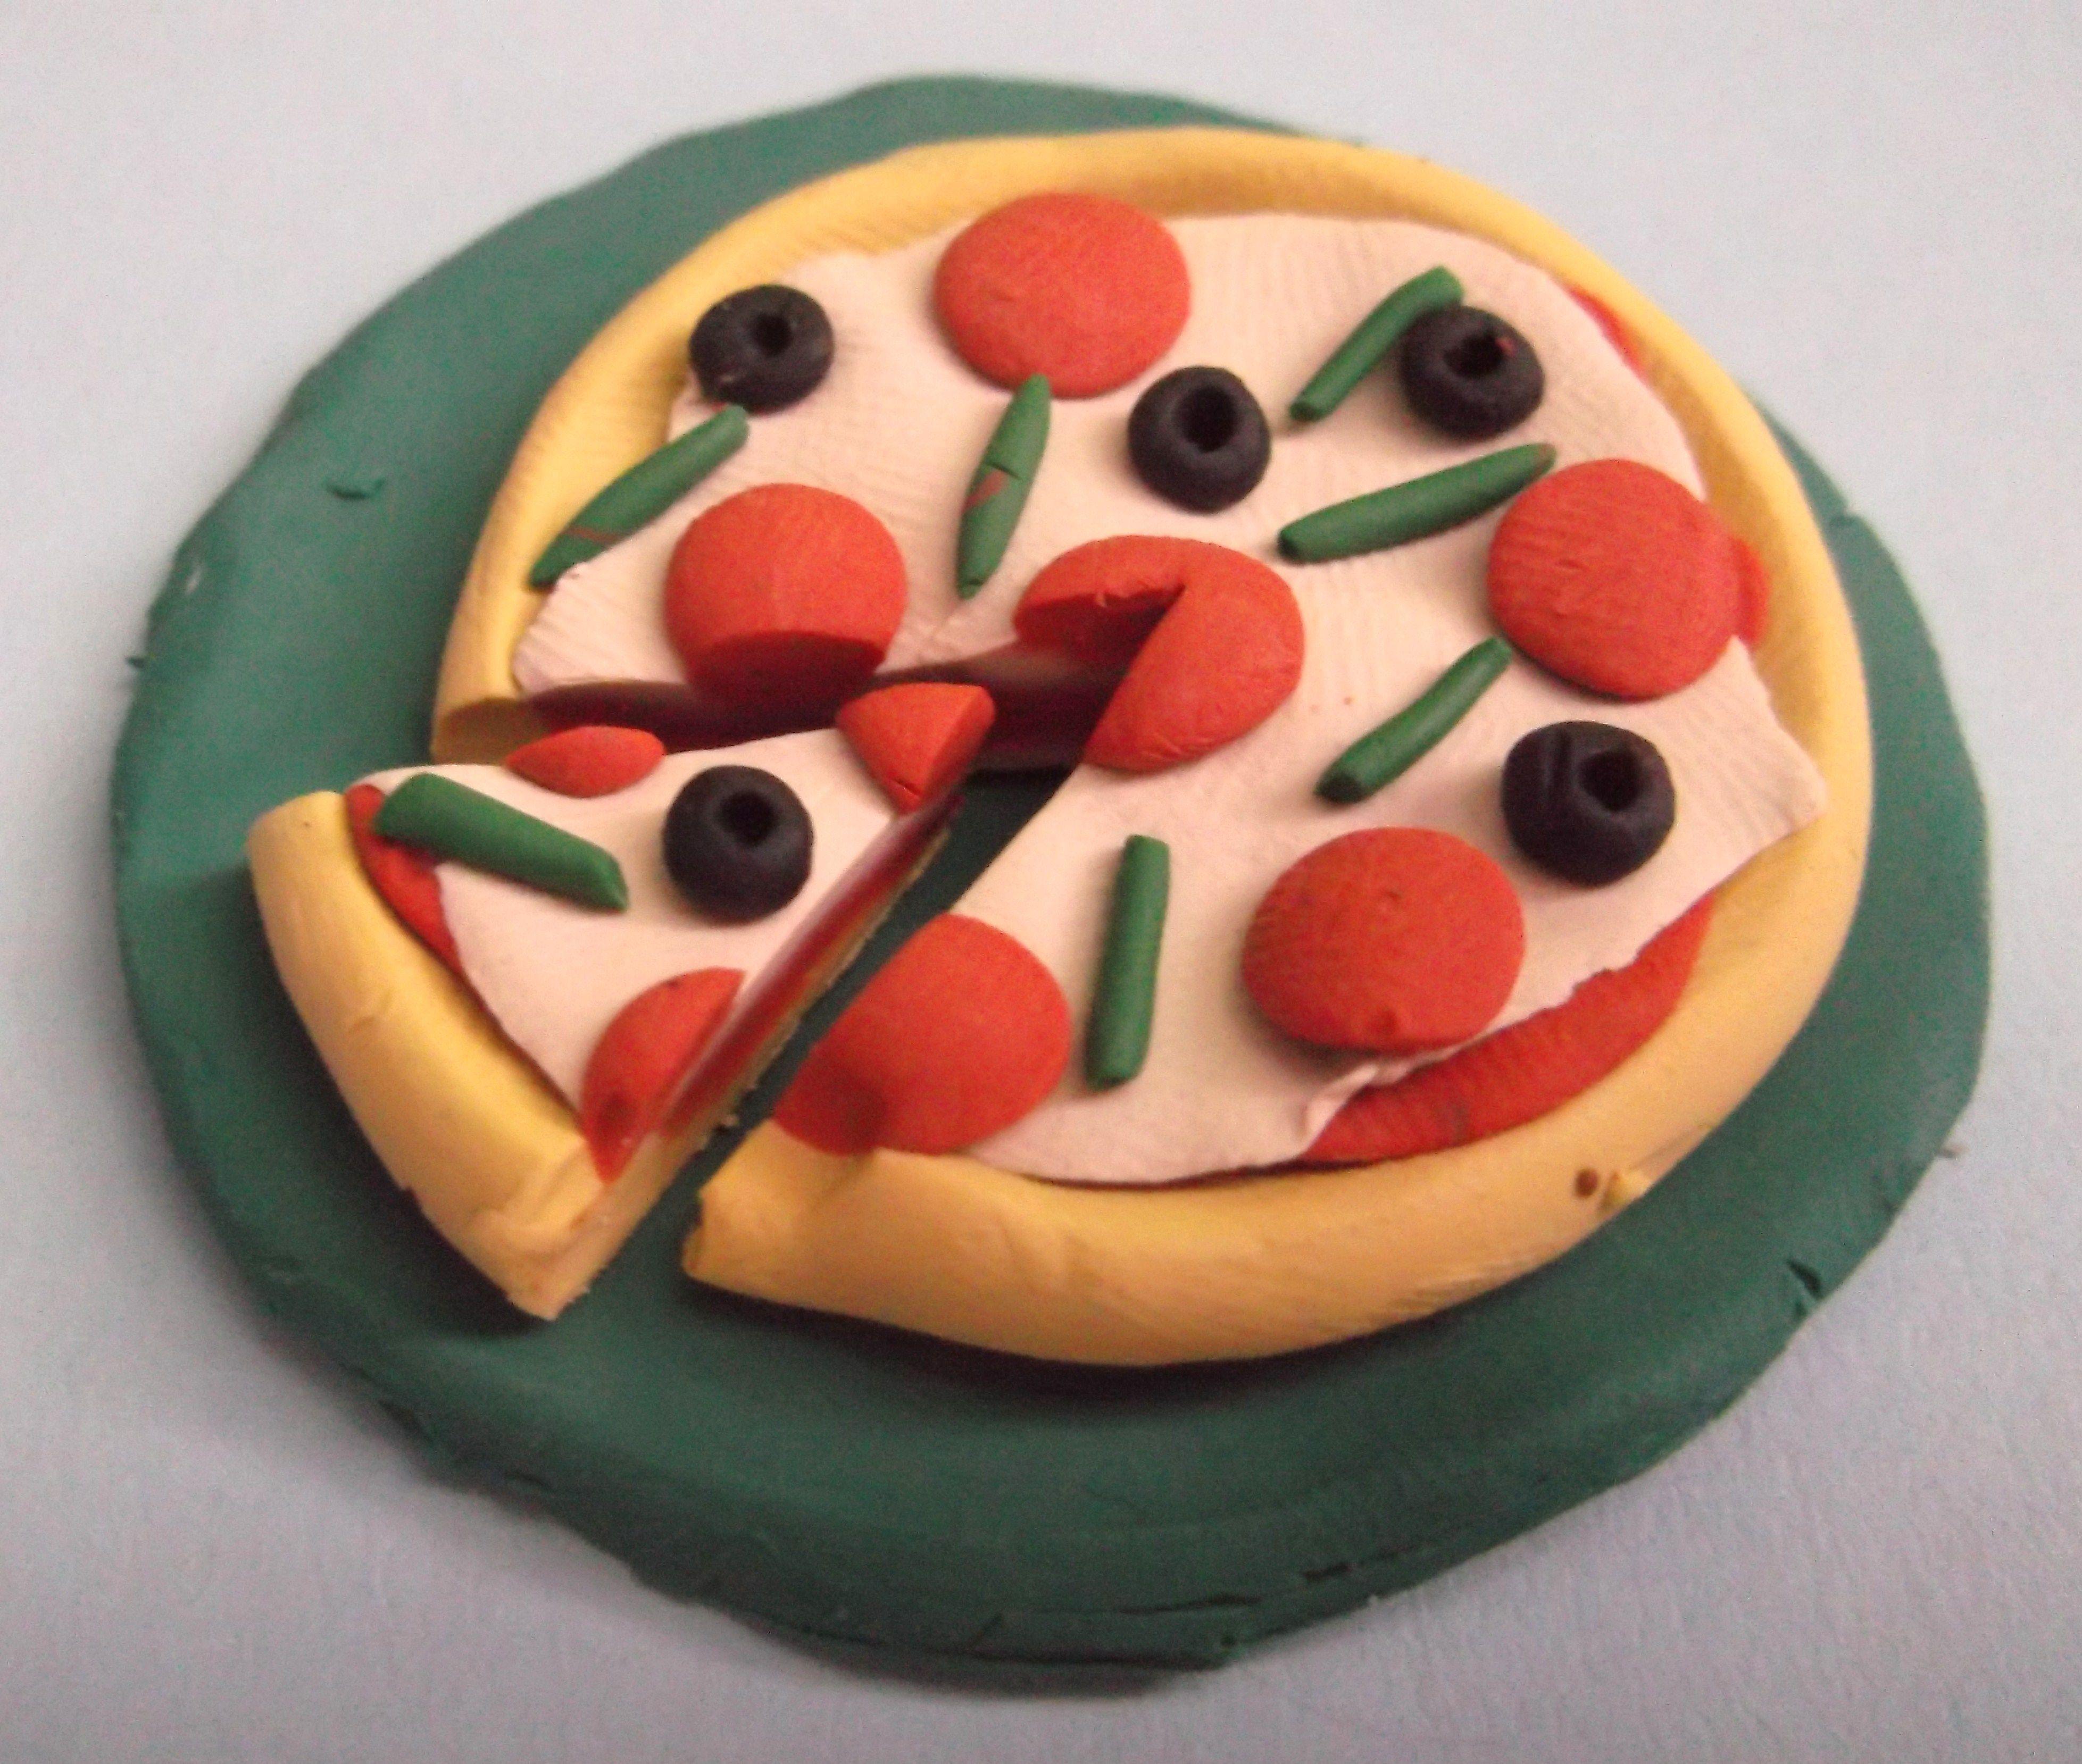 пицца картинки для поделок рождалась уляком